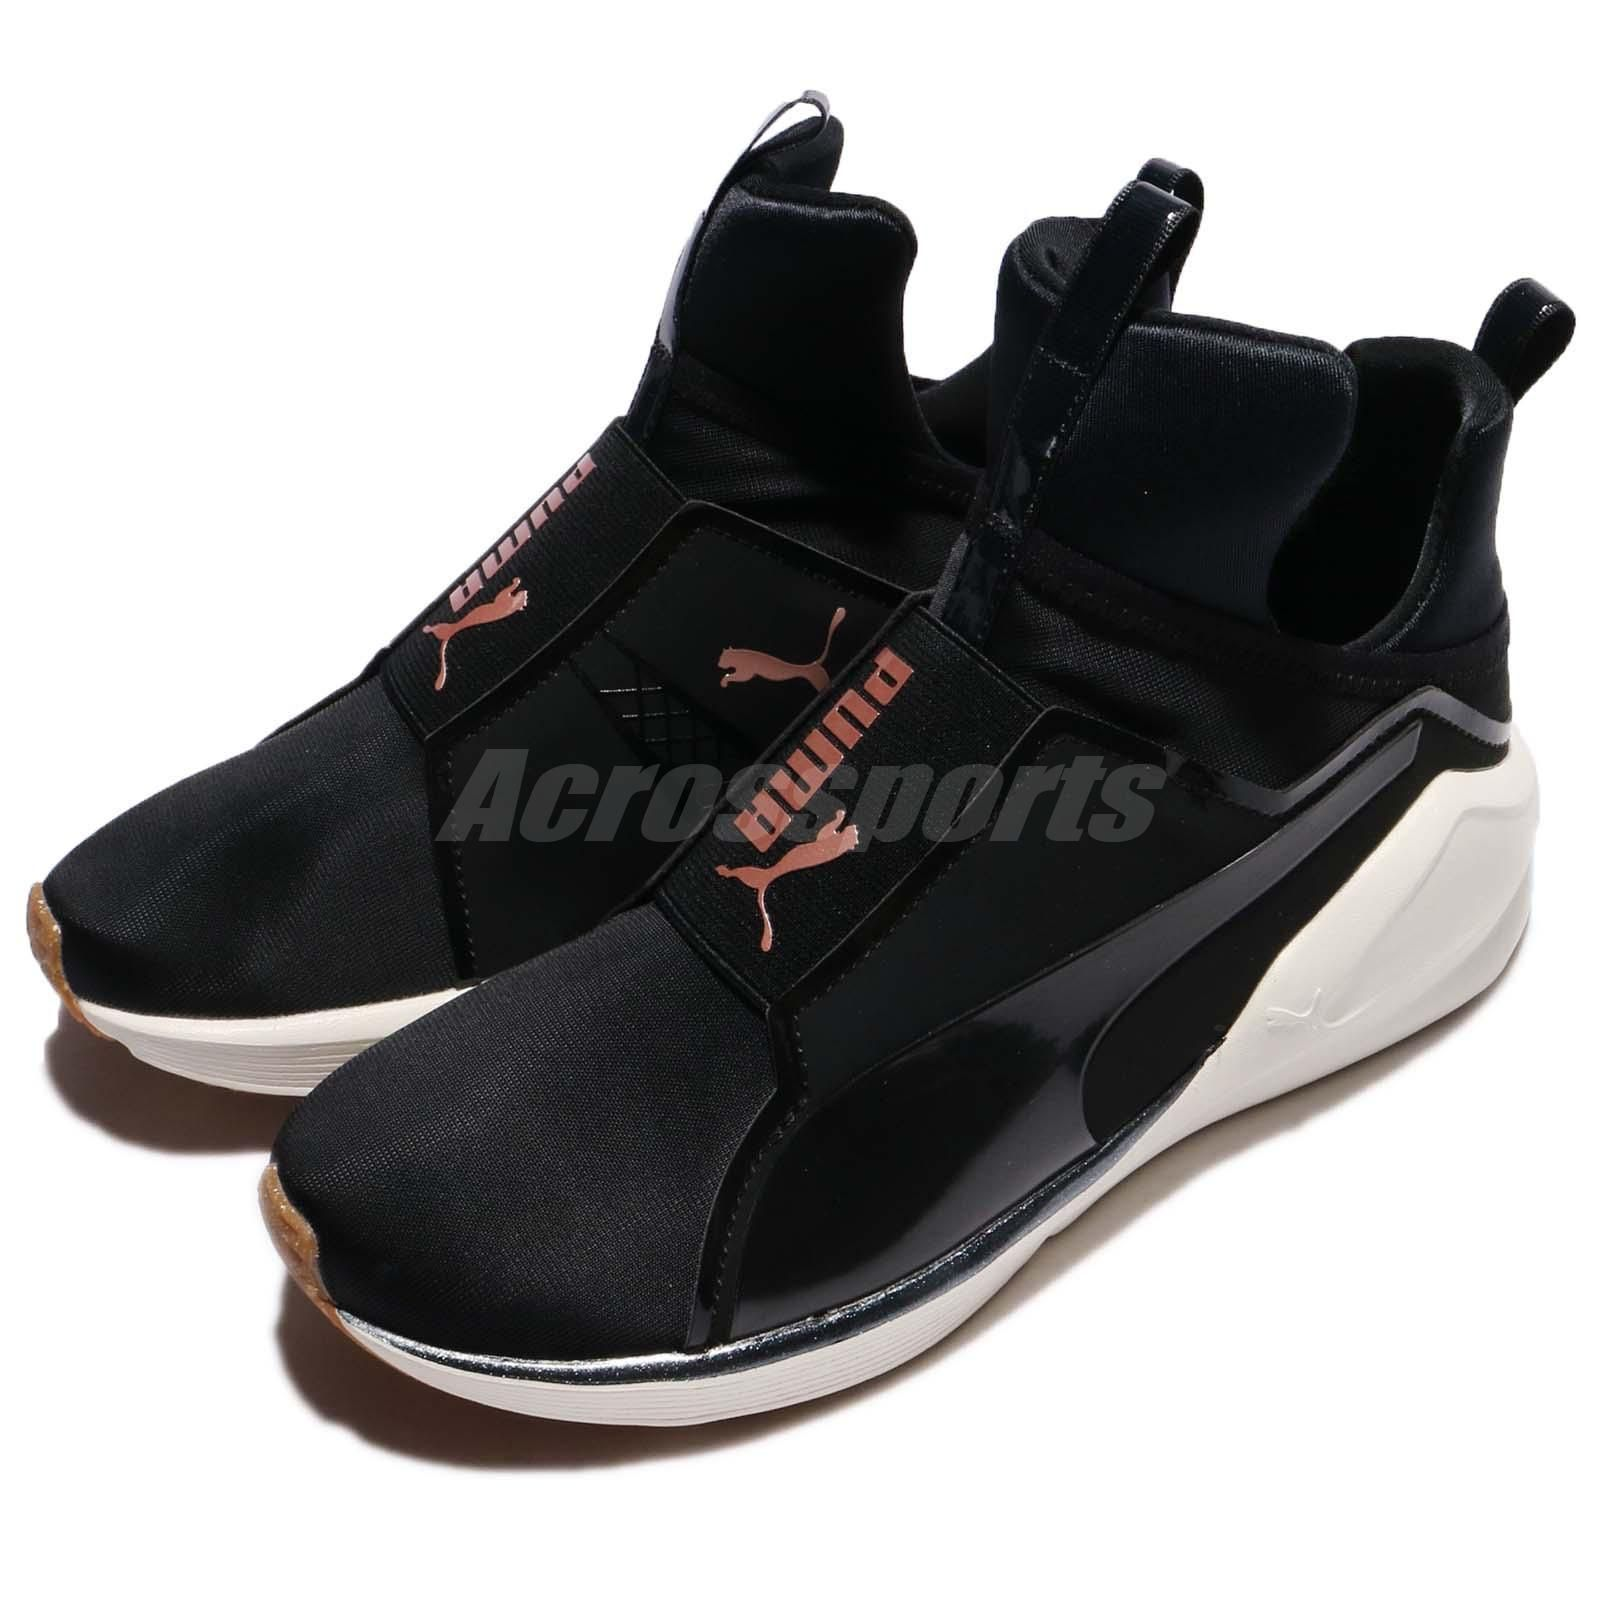 9d4f5866c95 Puma Fierce VR Wns Black Whisper White Women Training Shoes Trainers  19034701